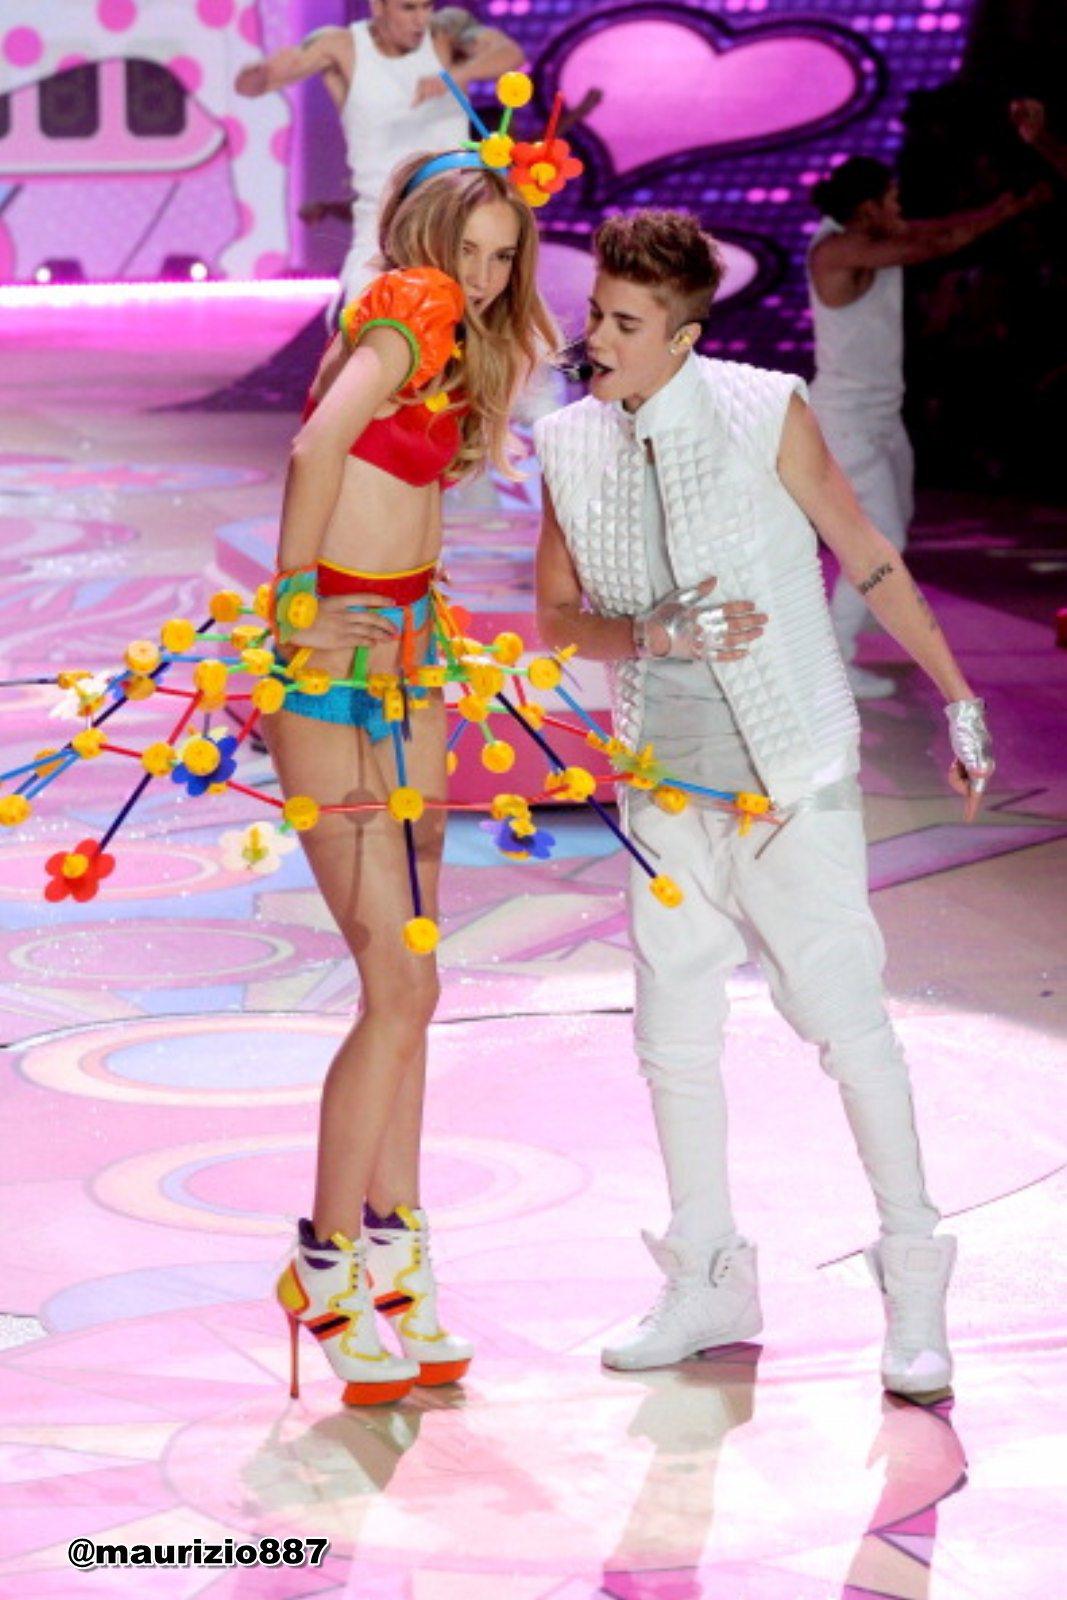 Justin Bieber Vs Fashion Show 2012 Justin Bieber Photo 32697843 Fanpop